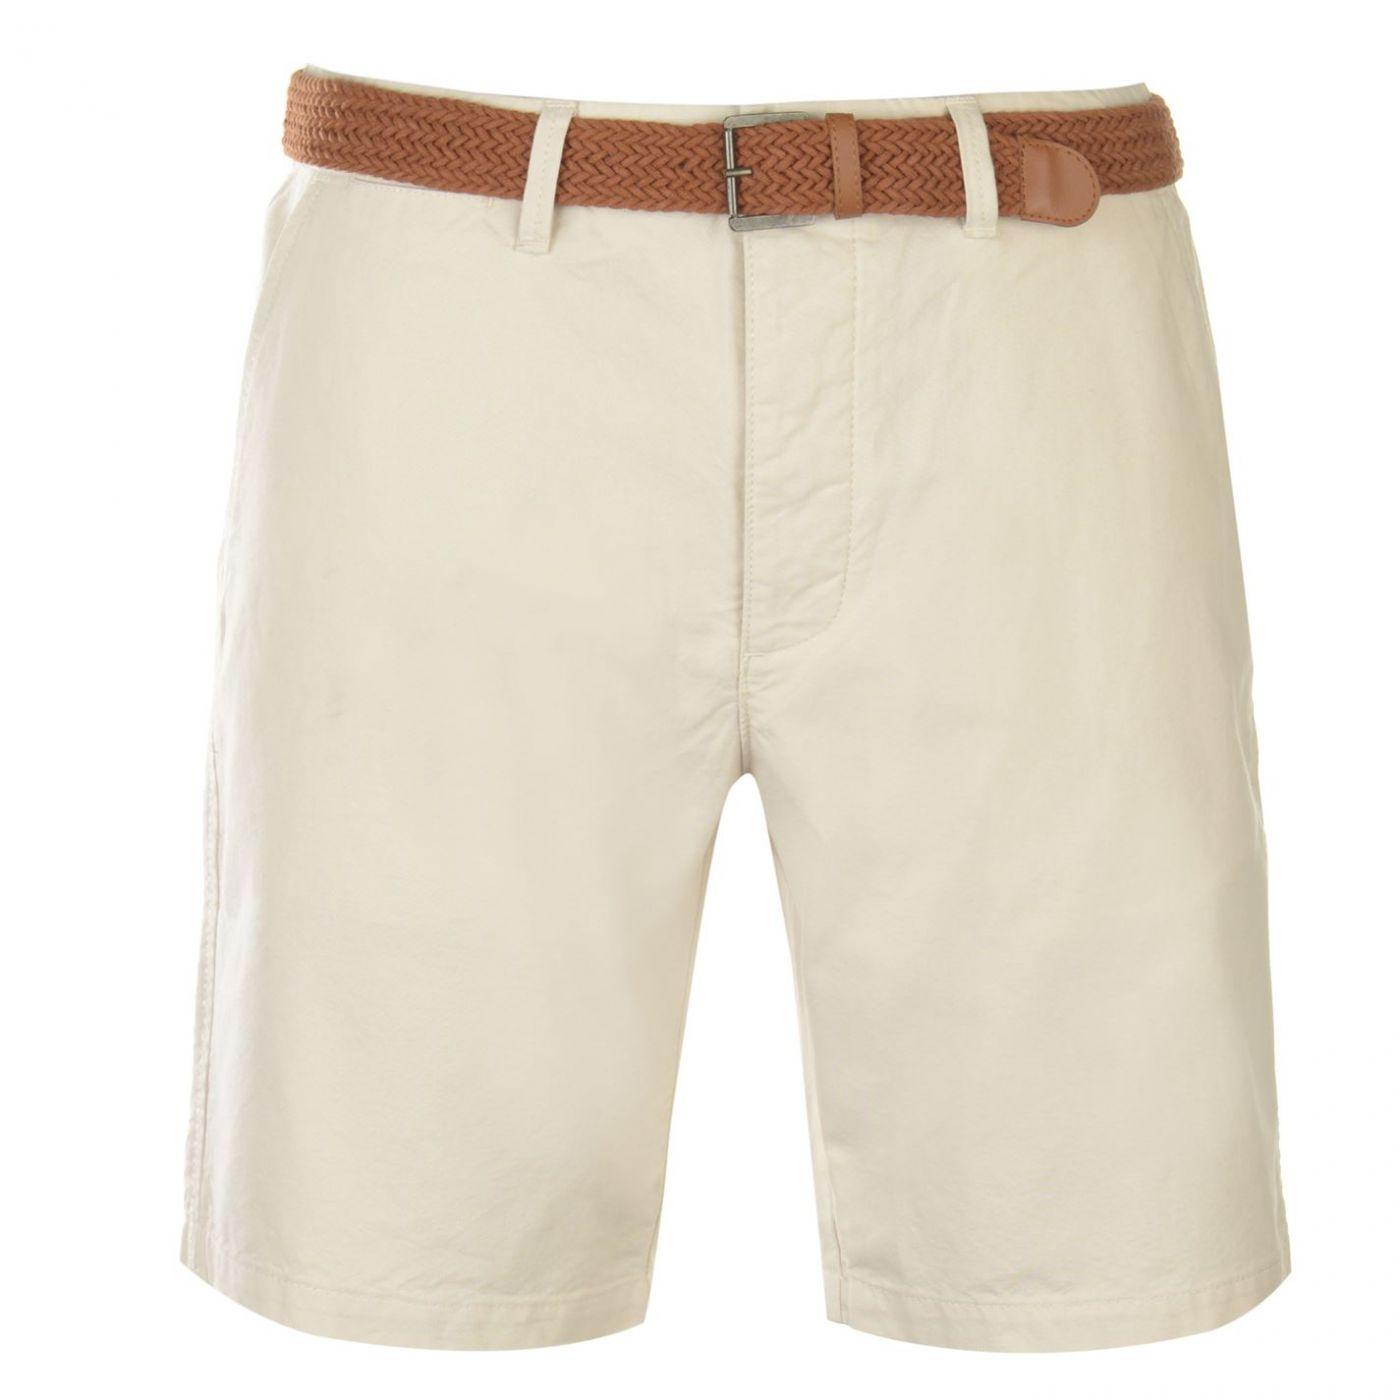 Pierre Cardin Oxford Short Mens